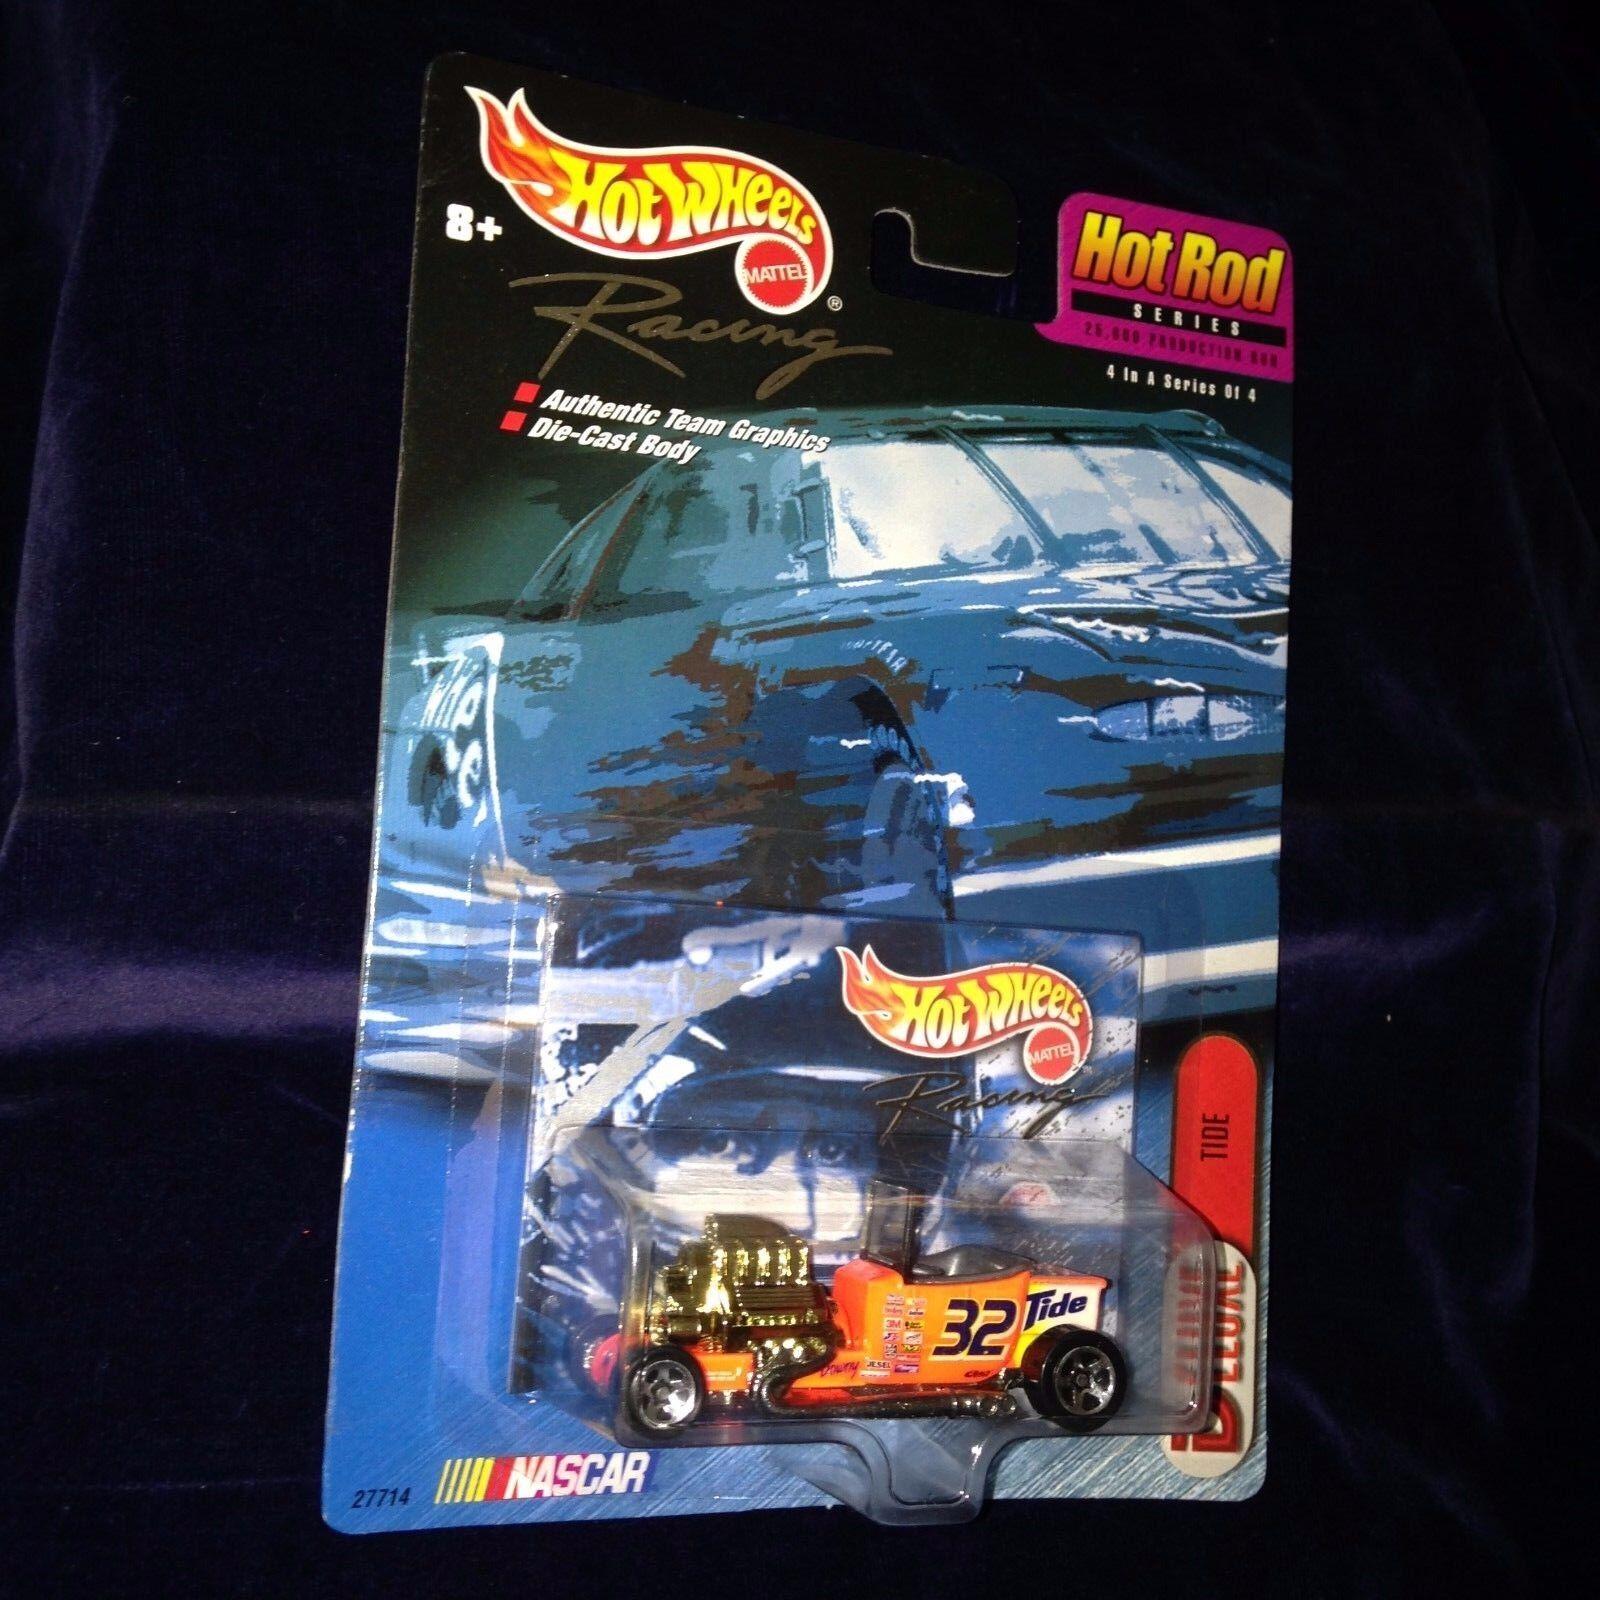 New Sealed 1999 Mattel Hot Wheels Racing Hot Rod Series Tide Nascar